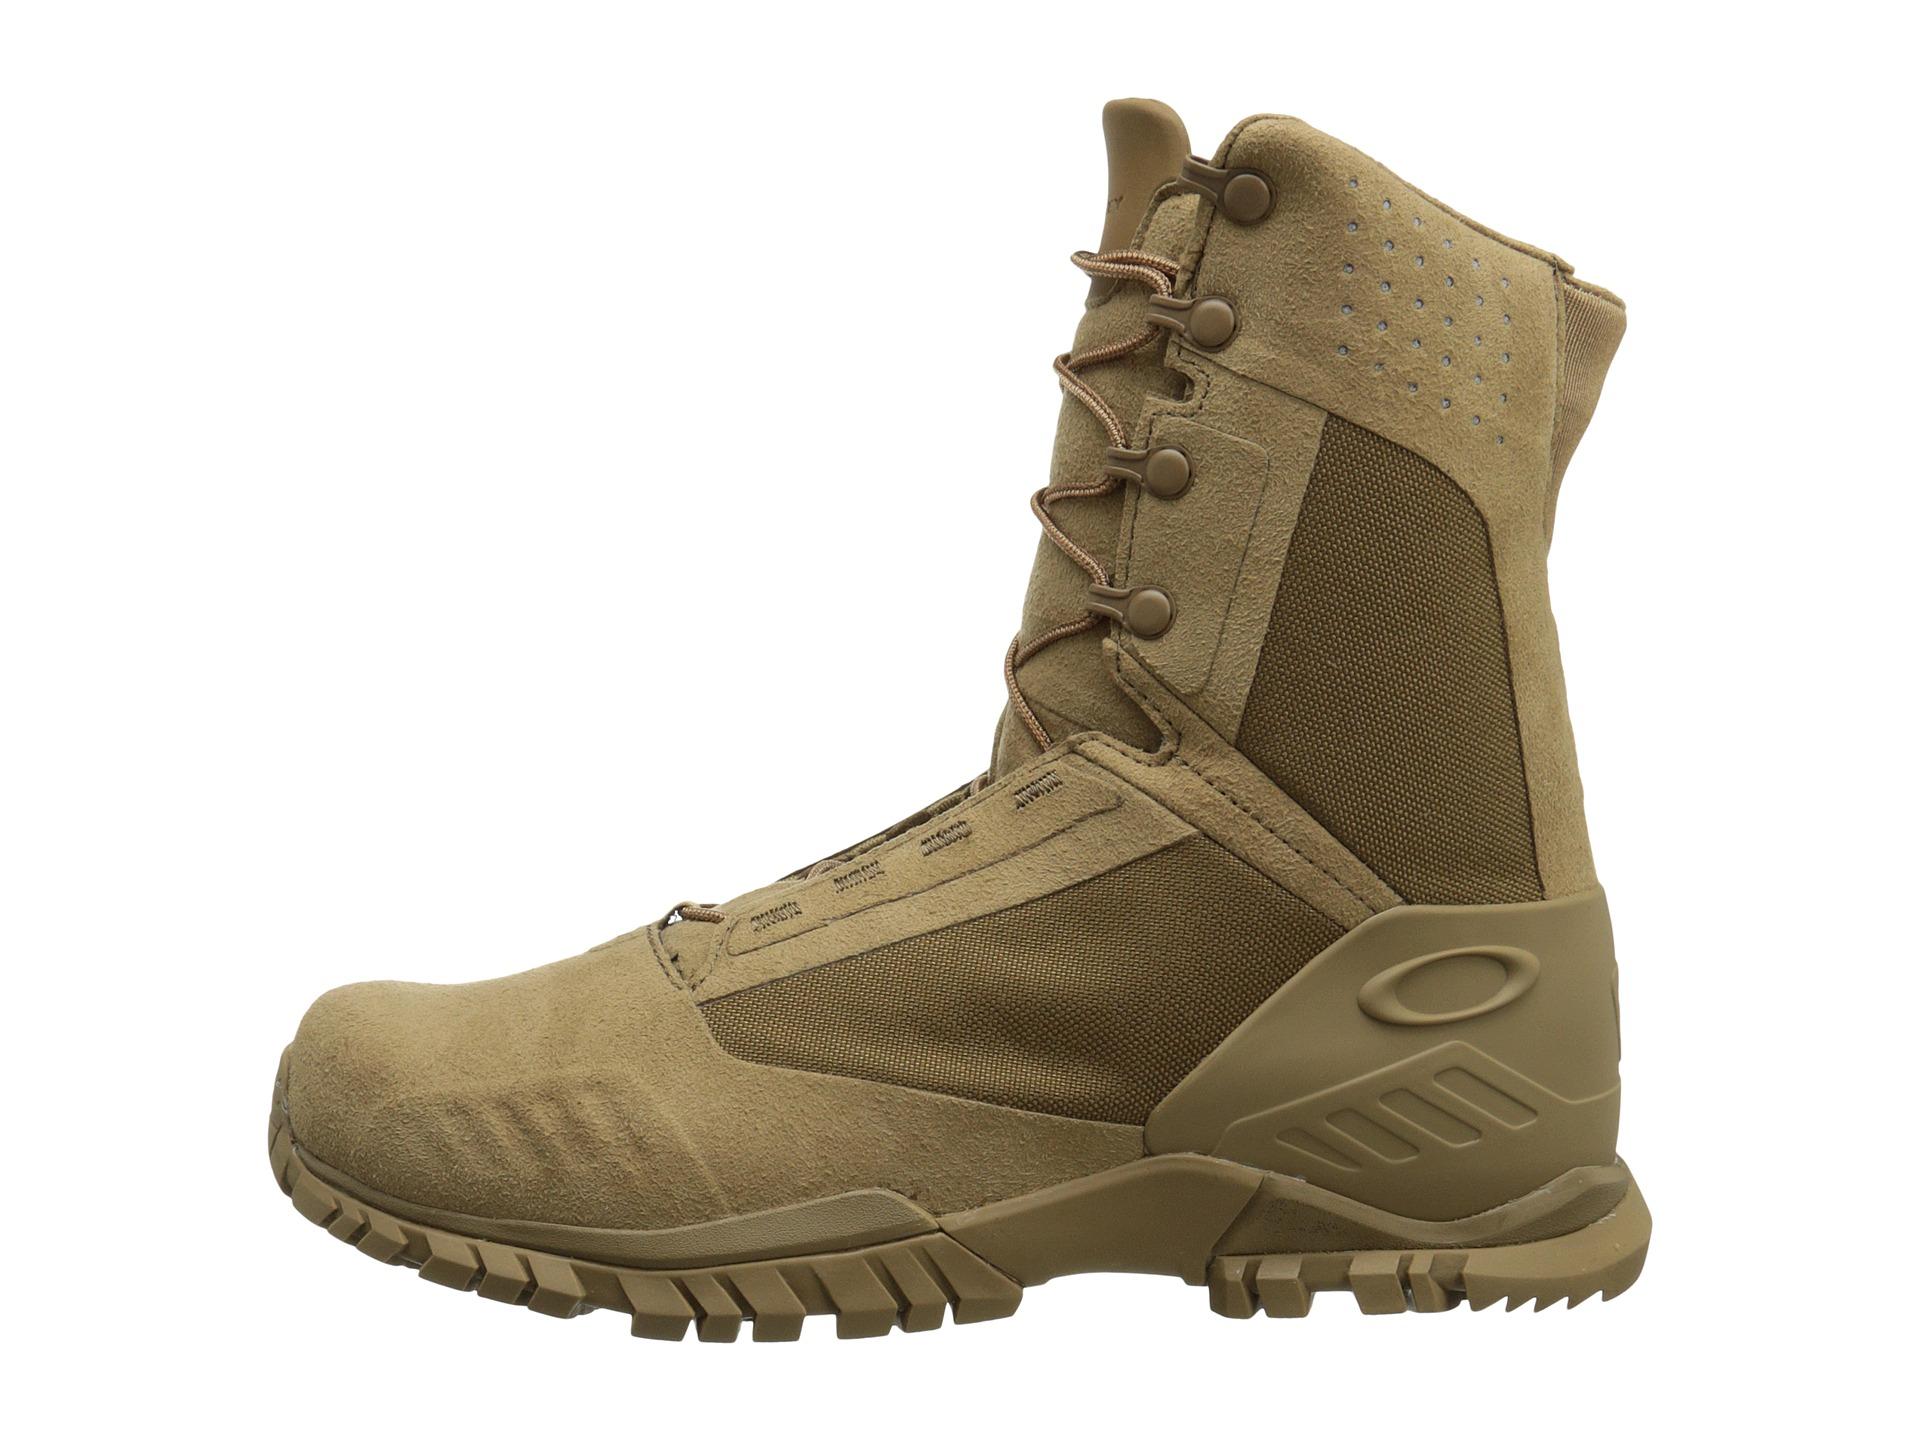 ccdb33b206 Oakleys Military Boots « Heritage Malta